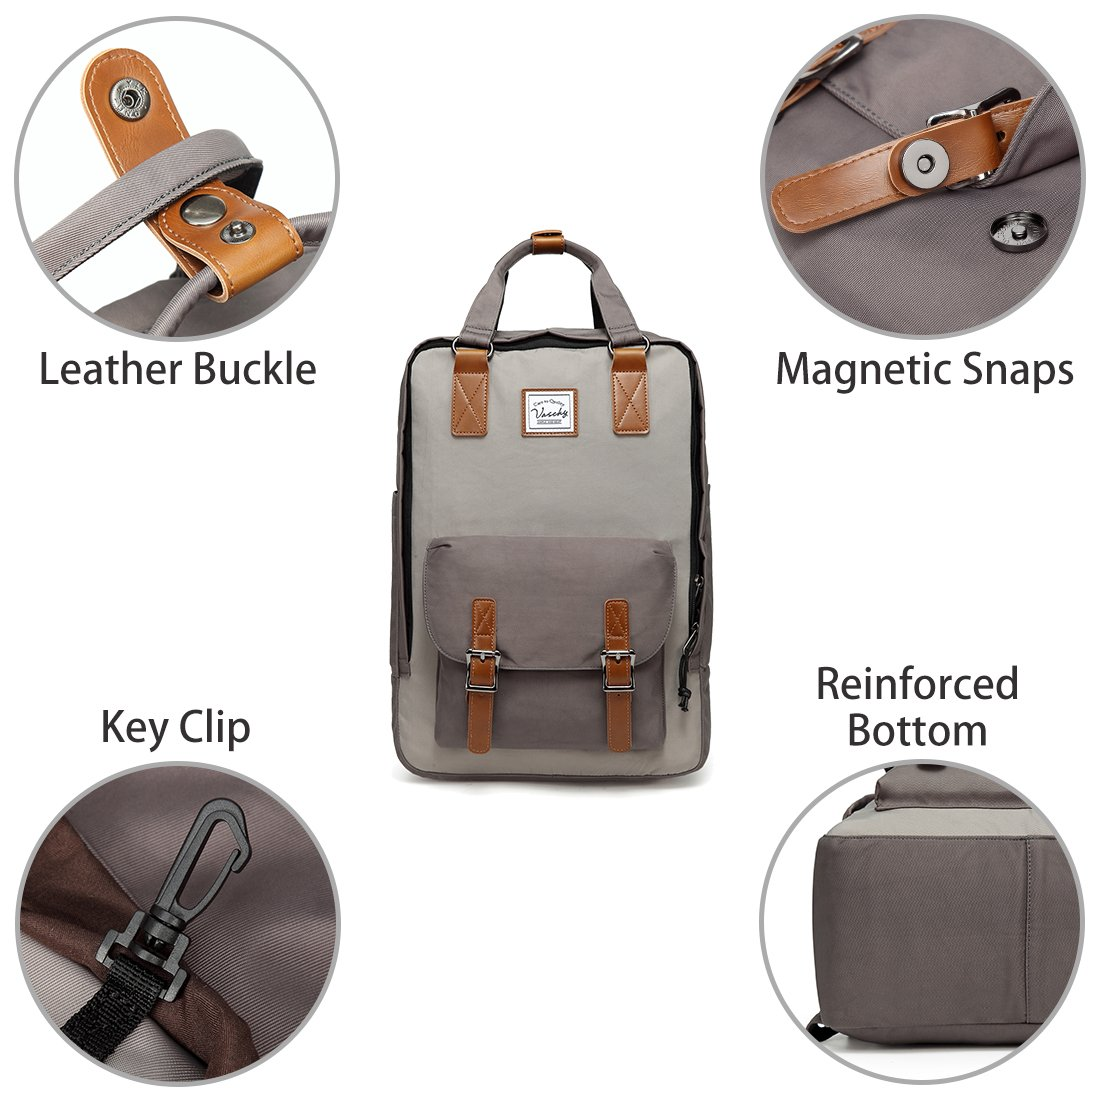 Amazon.com: School Backpack,VASCHY Unisex Vintage Water Resistant 15in Laptop Backpack Bookbag for College Gray: VaschyDirect